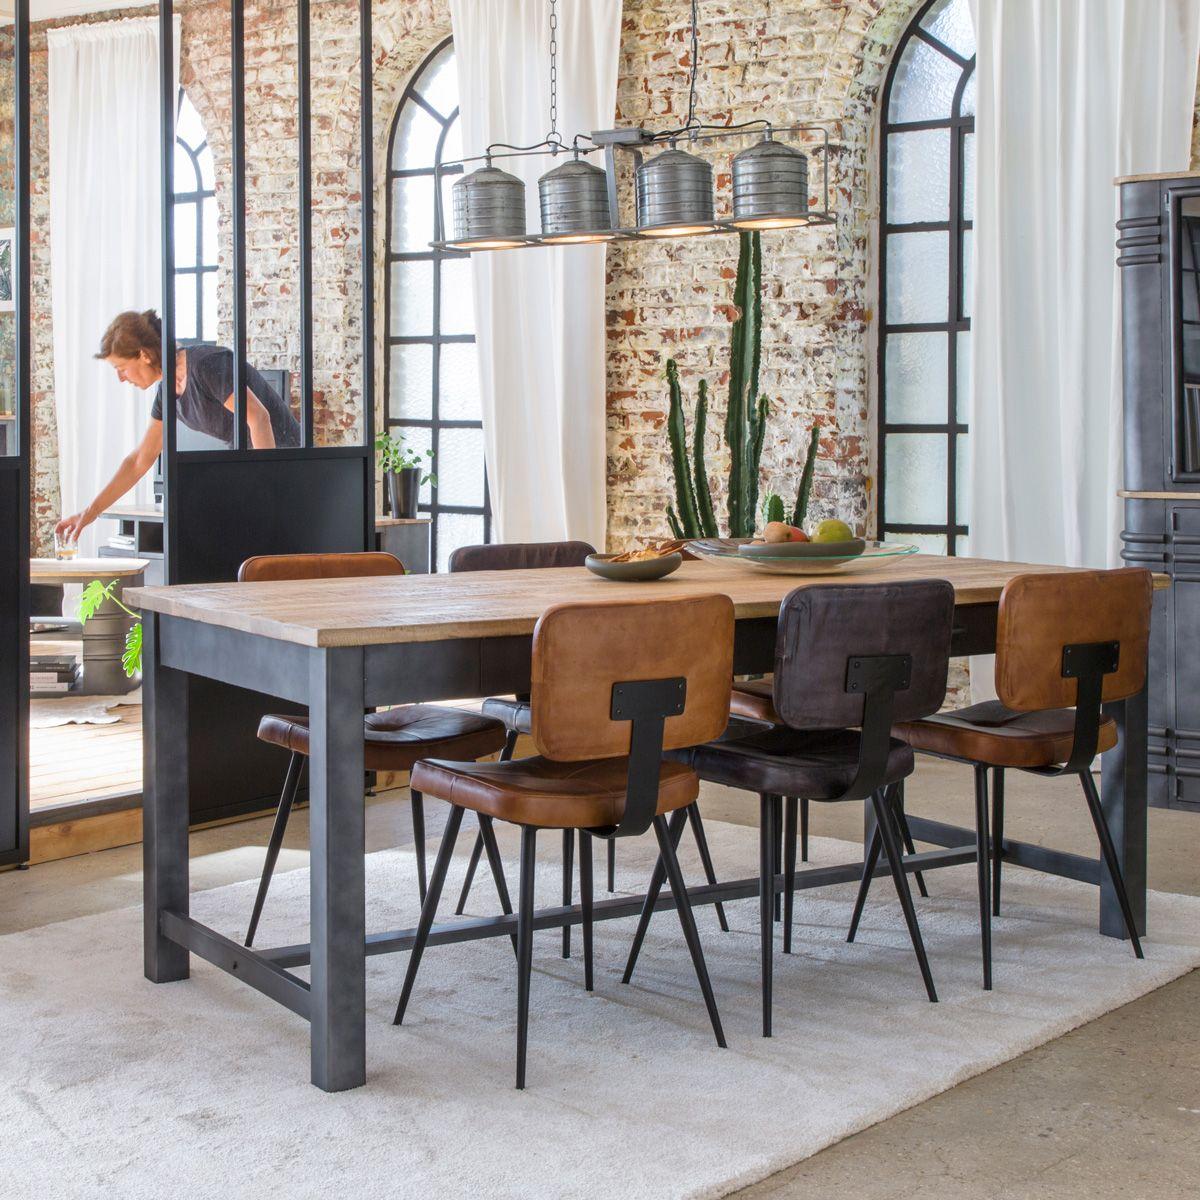 Table A Manger Bois Et Metal Gris 4 Tiroirs En 2020 Table A Manger Bois Et Metal Chaise Industrielle Table Salle A Manger